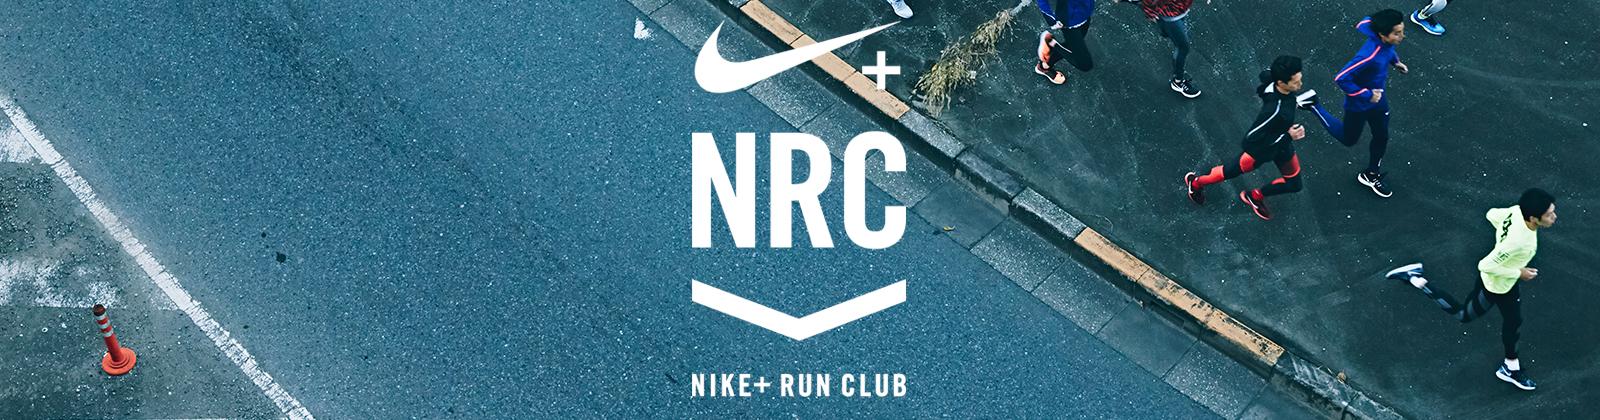 nike go run